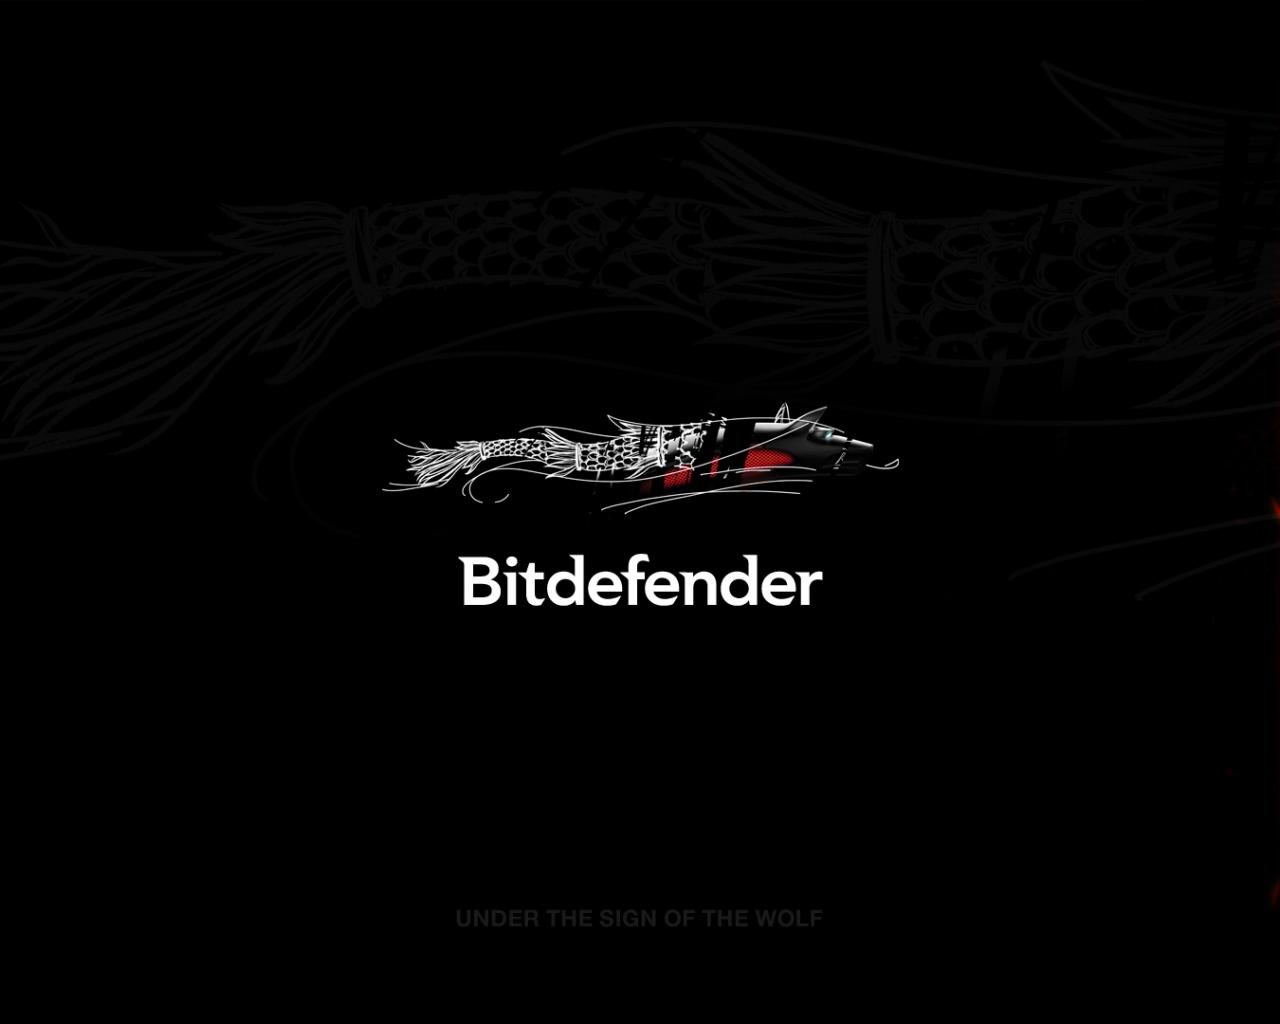 download Bitdefender Wallpapers Logos Download HD Images 1280x1024